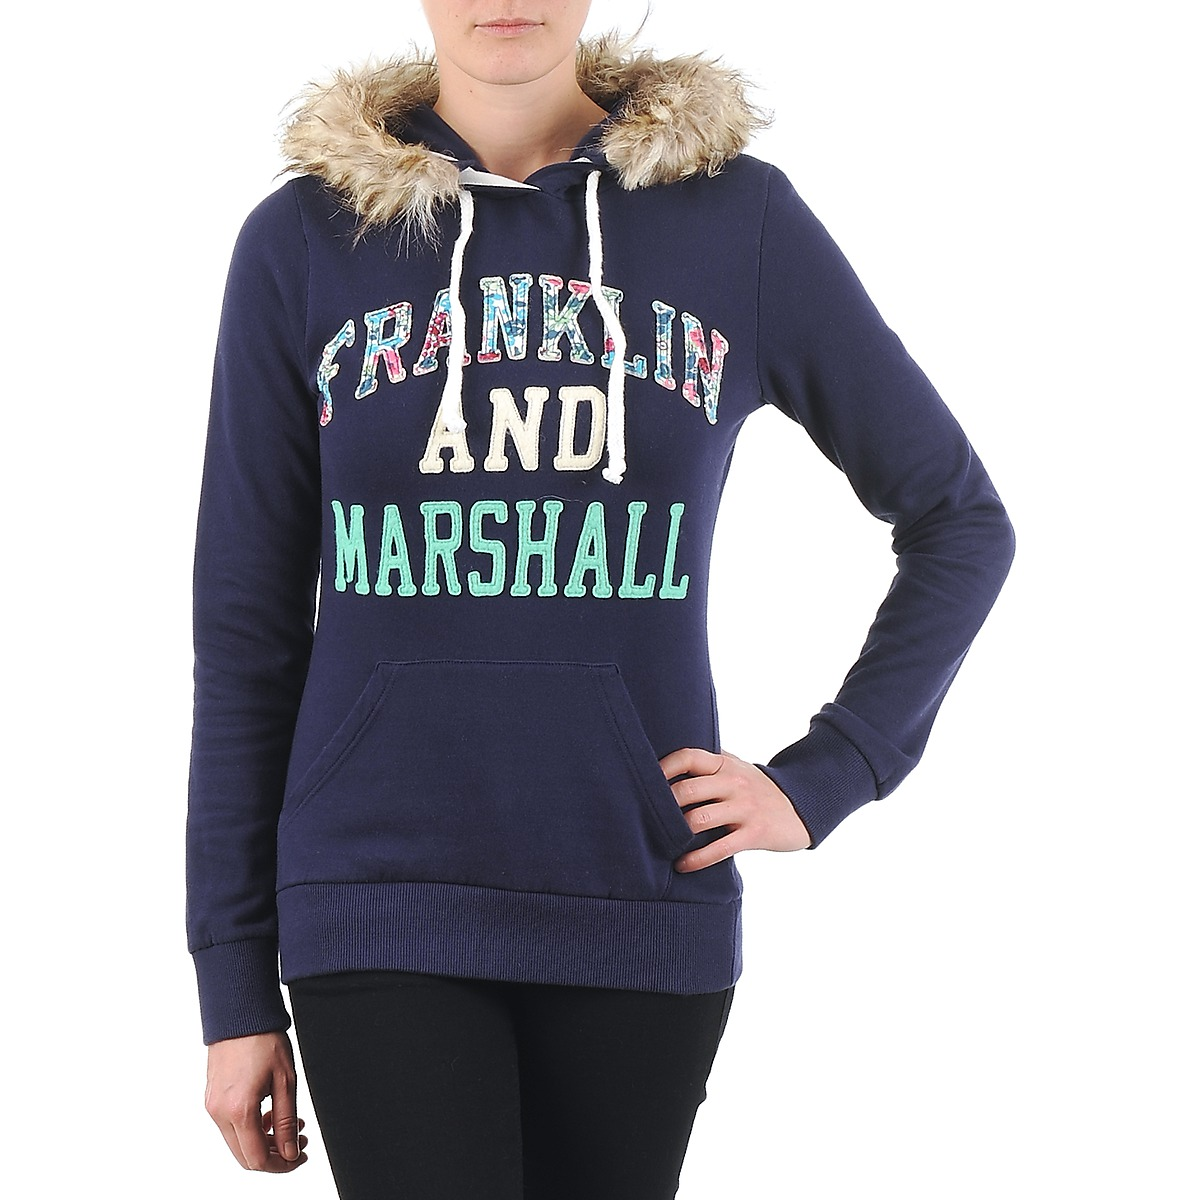 Franklin & Marshall COWICHAN Marine